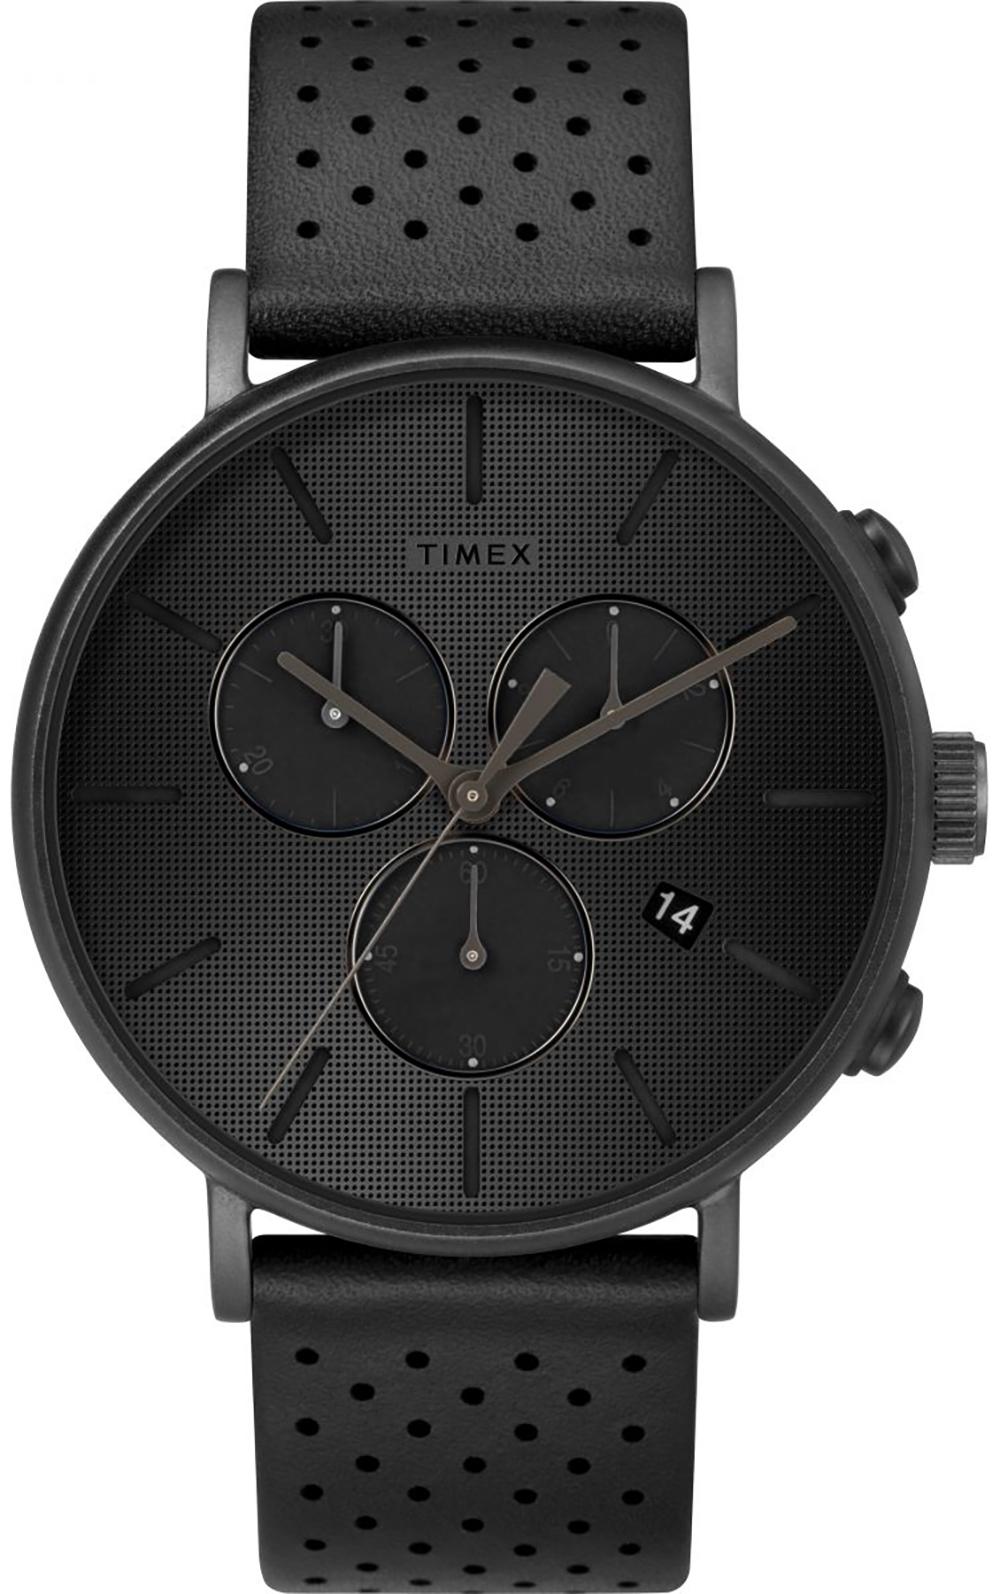 Zegarek męski Timex fairfield TW2R79800 - duże 1